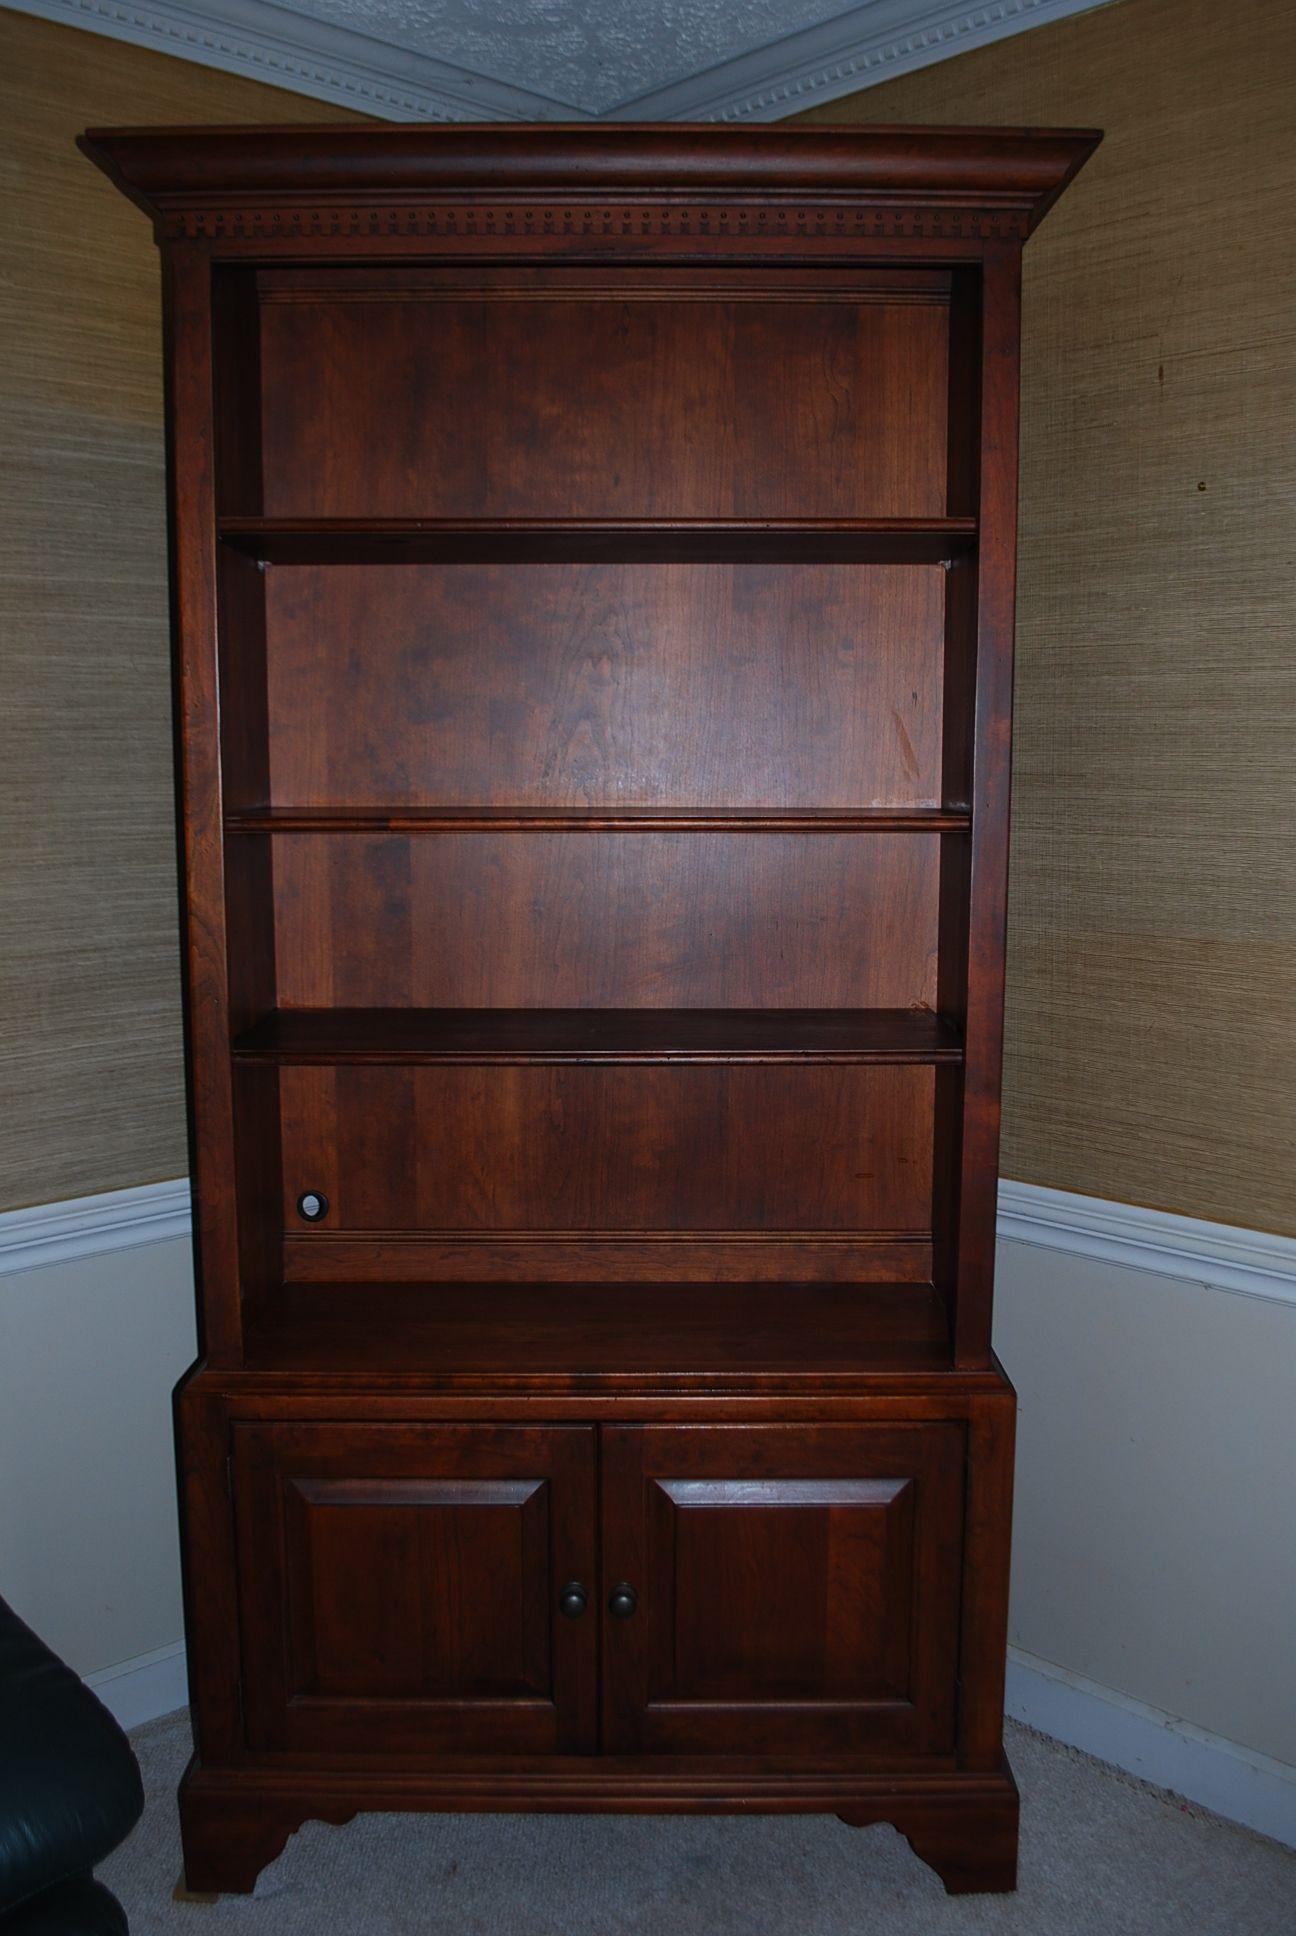 Bob Timberlake Cherry Bookshelf For The Home Pinterest